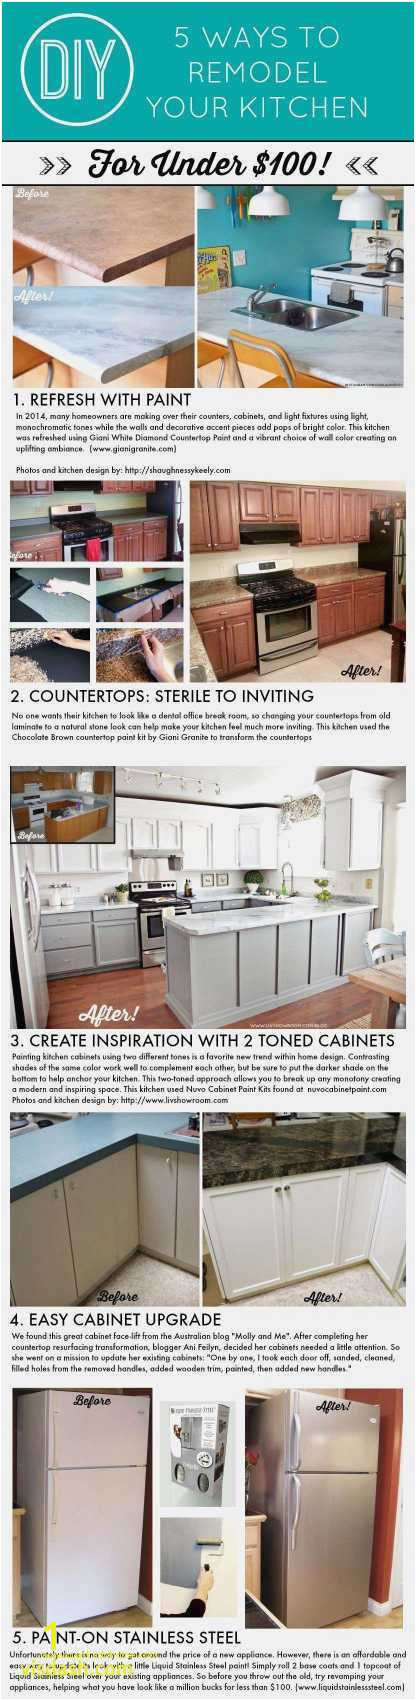 Bathroom Ideas B&q for Home Design New Kitchen Units B&q Popularly Dans Earl